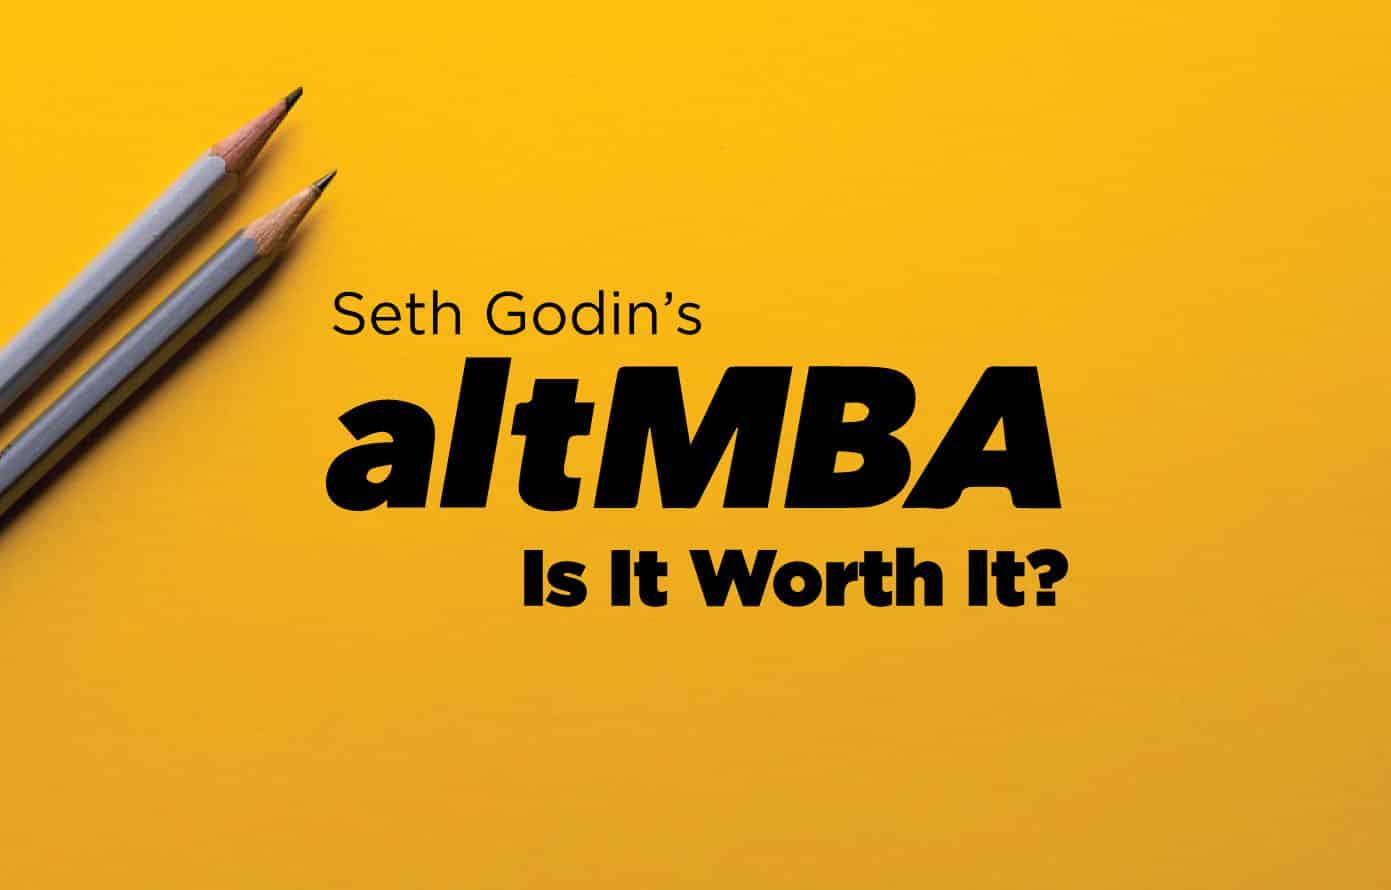 Seth Godin's AltMBA Reviews